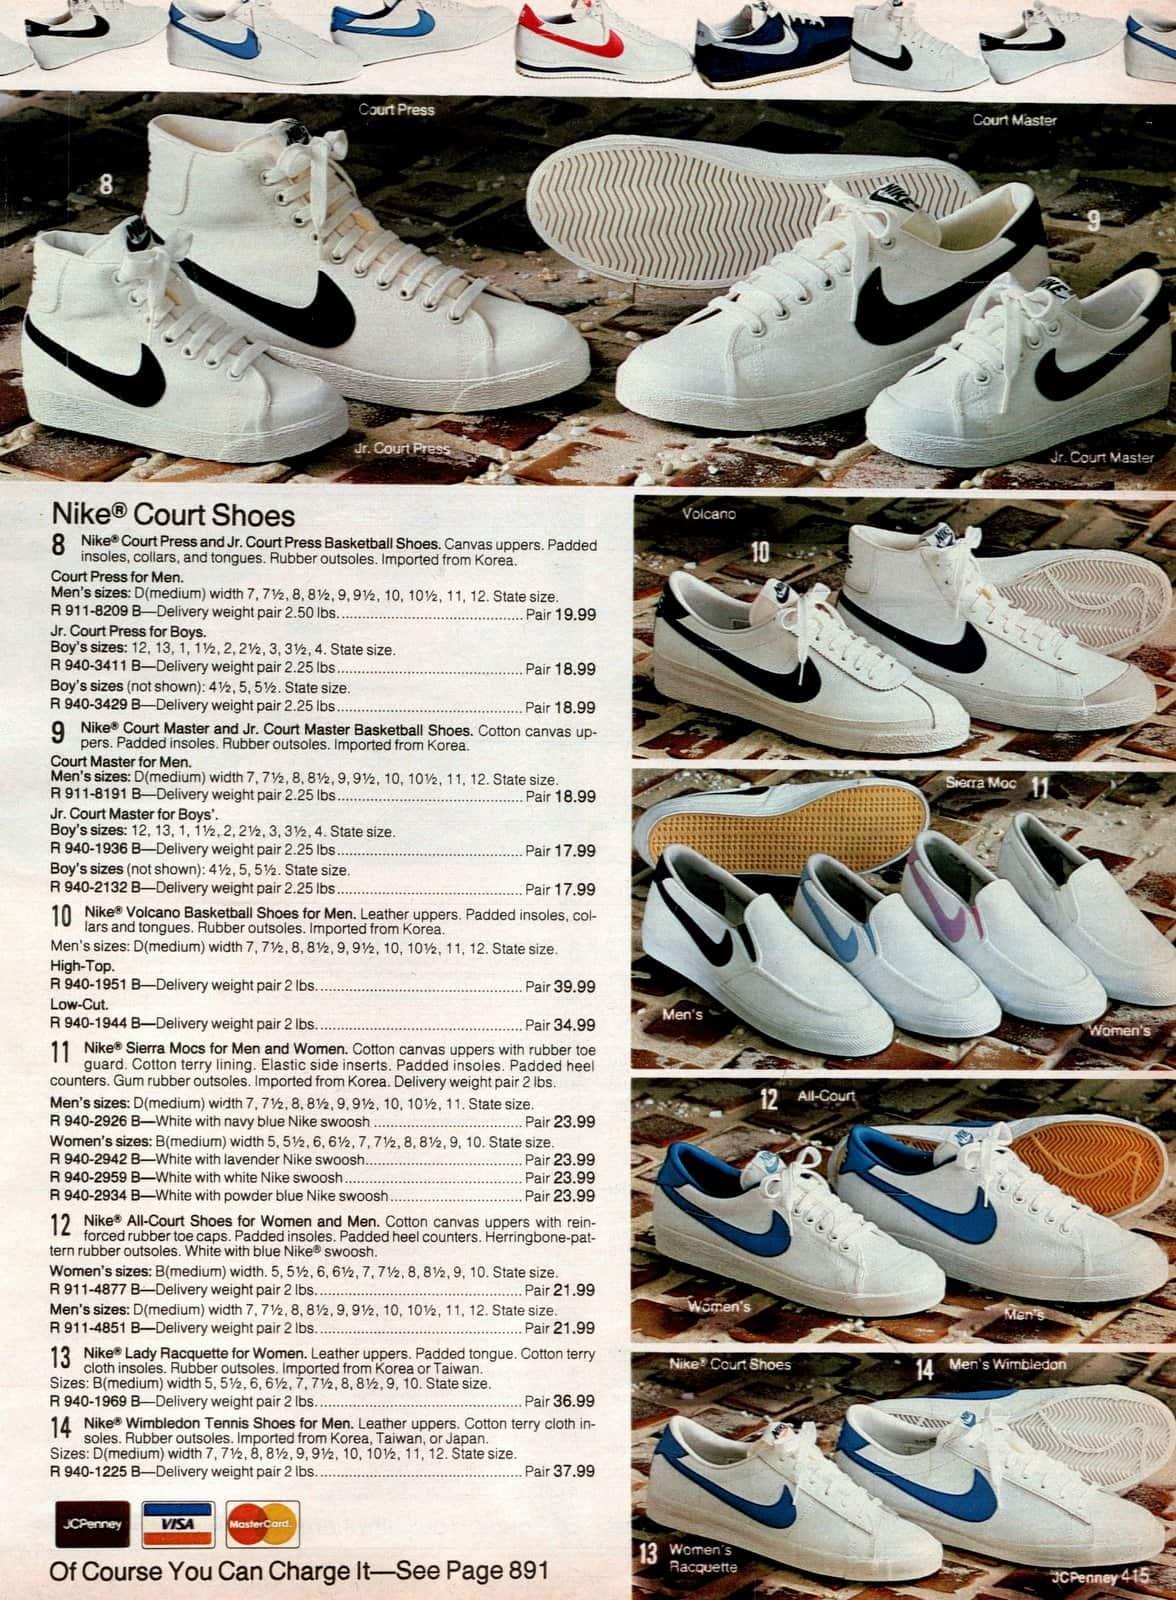 Vintage Nike Court Shoes (1983)